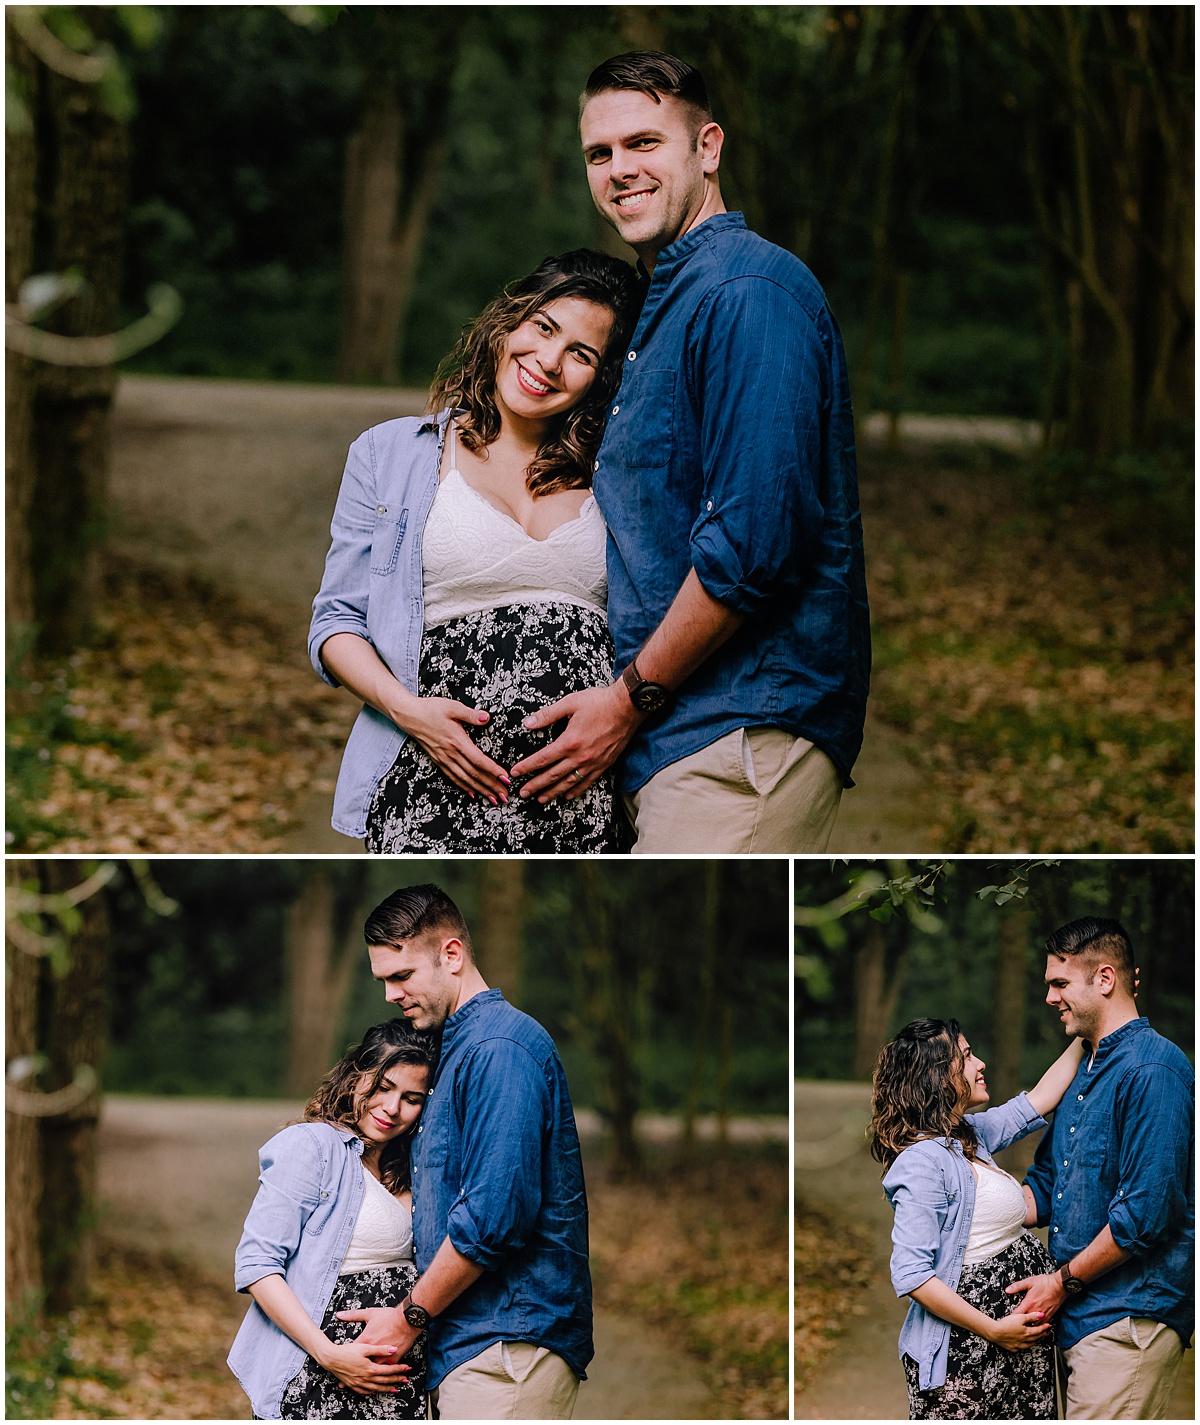 Maternity-Photo-Session-Brakenridge-Park-San-Antonio-Texas-Carly-Barton-Photography_0001.jpg